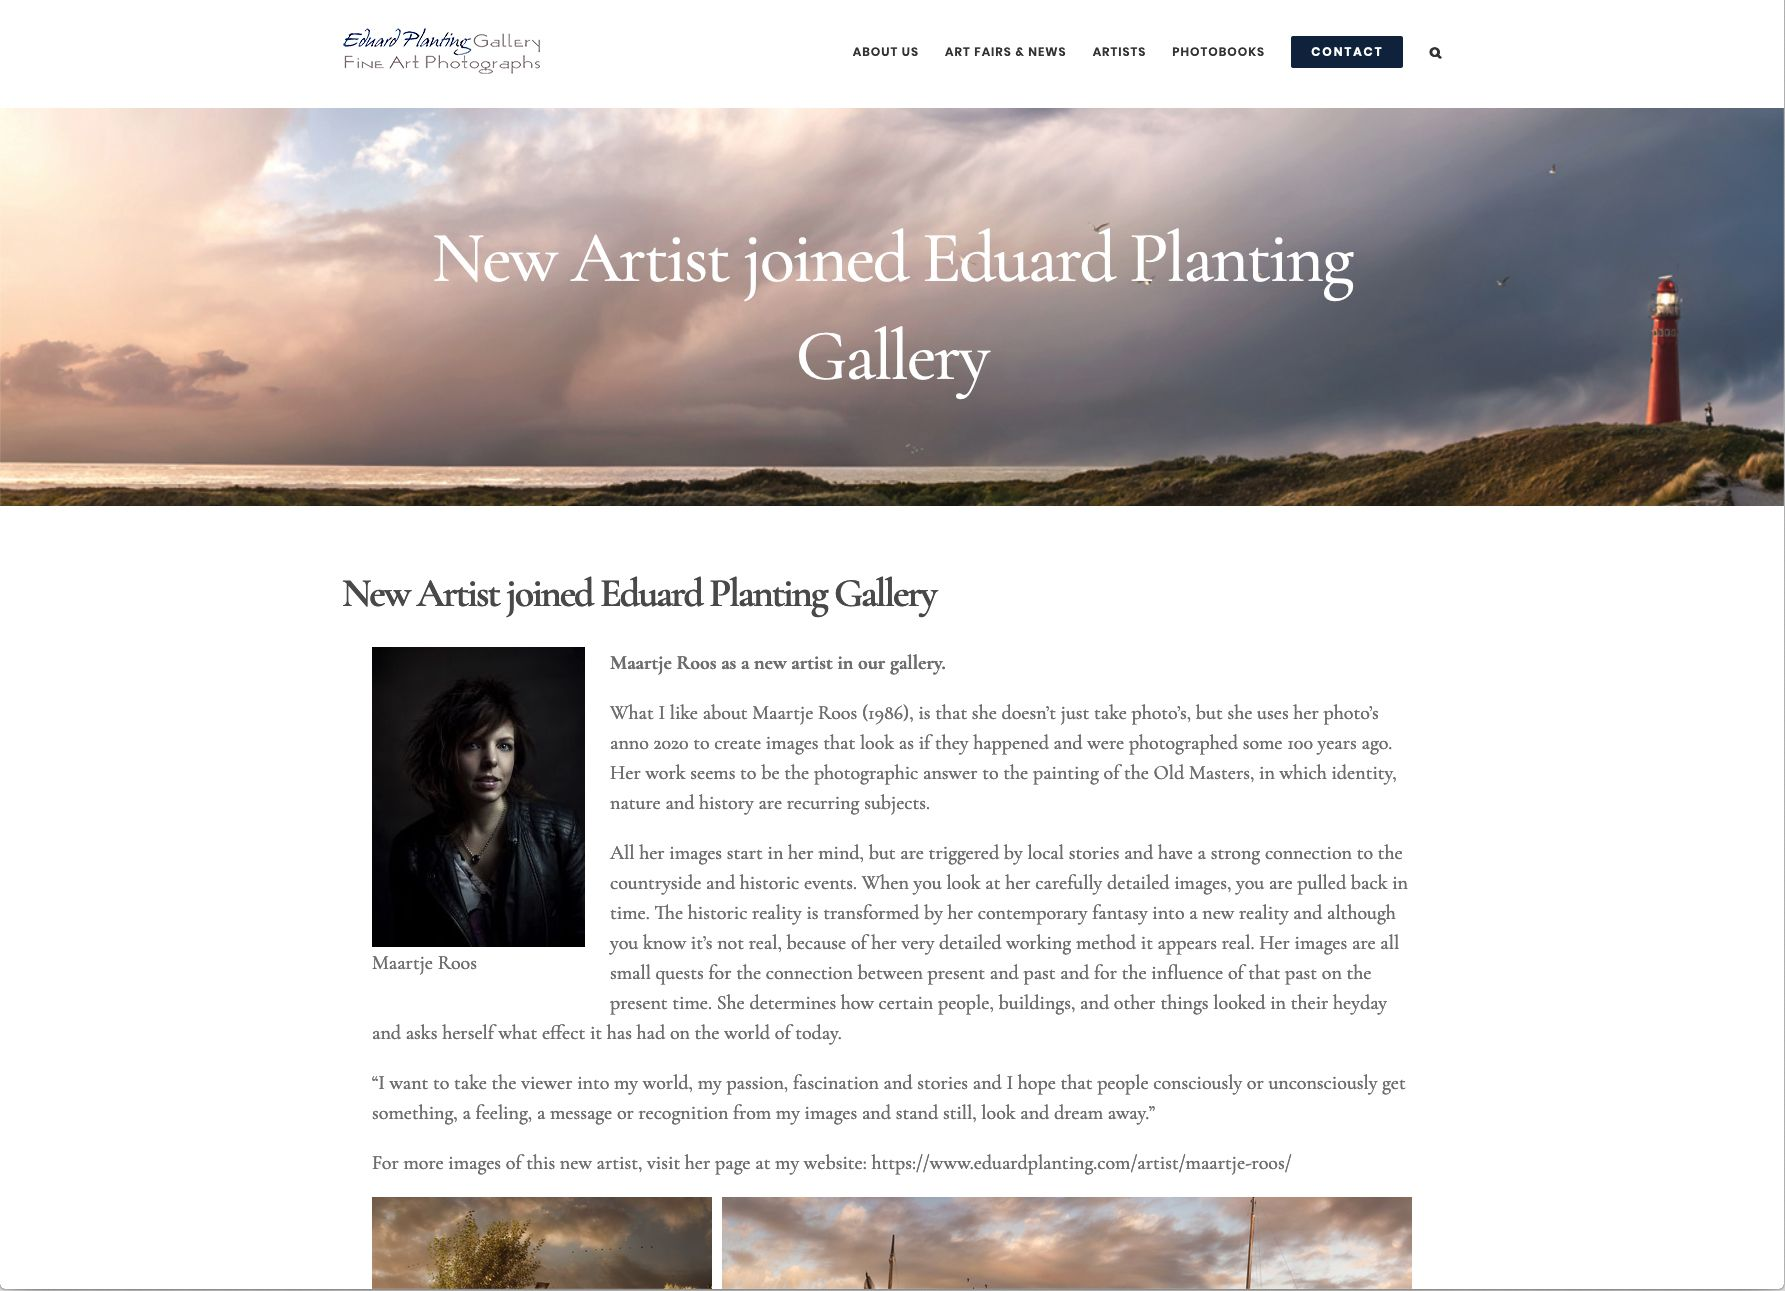 Vertegenwoordigd door Eduard Planting Gallery